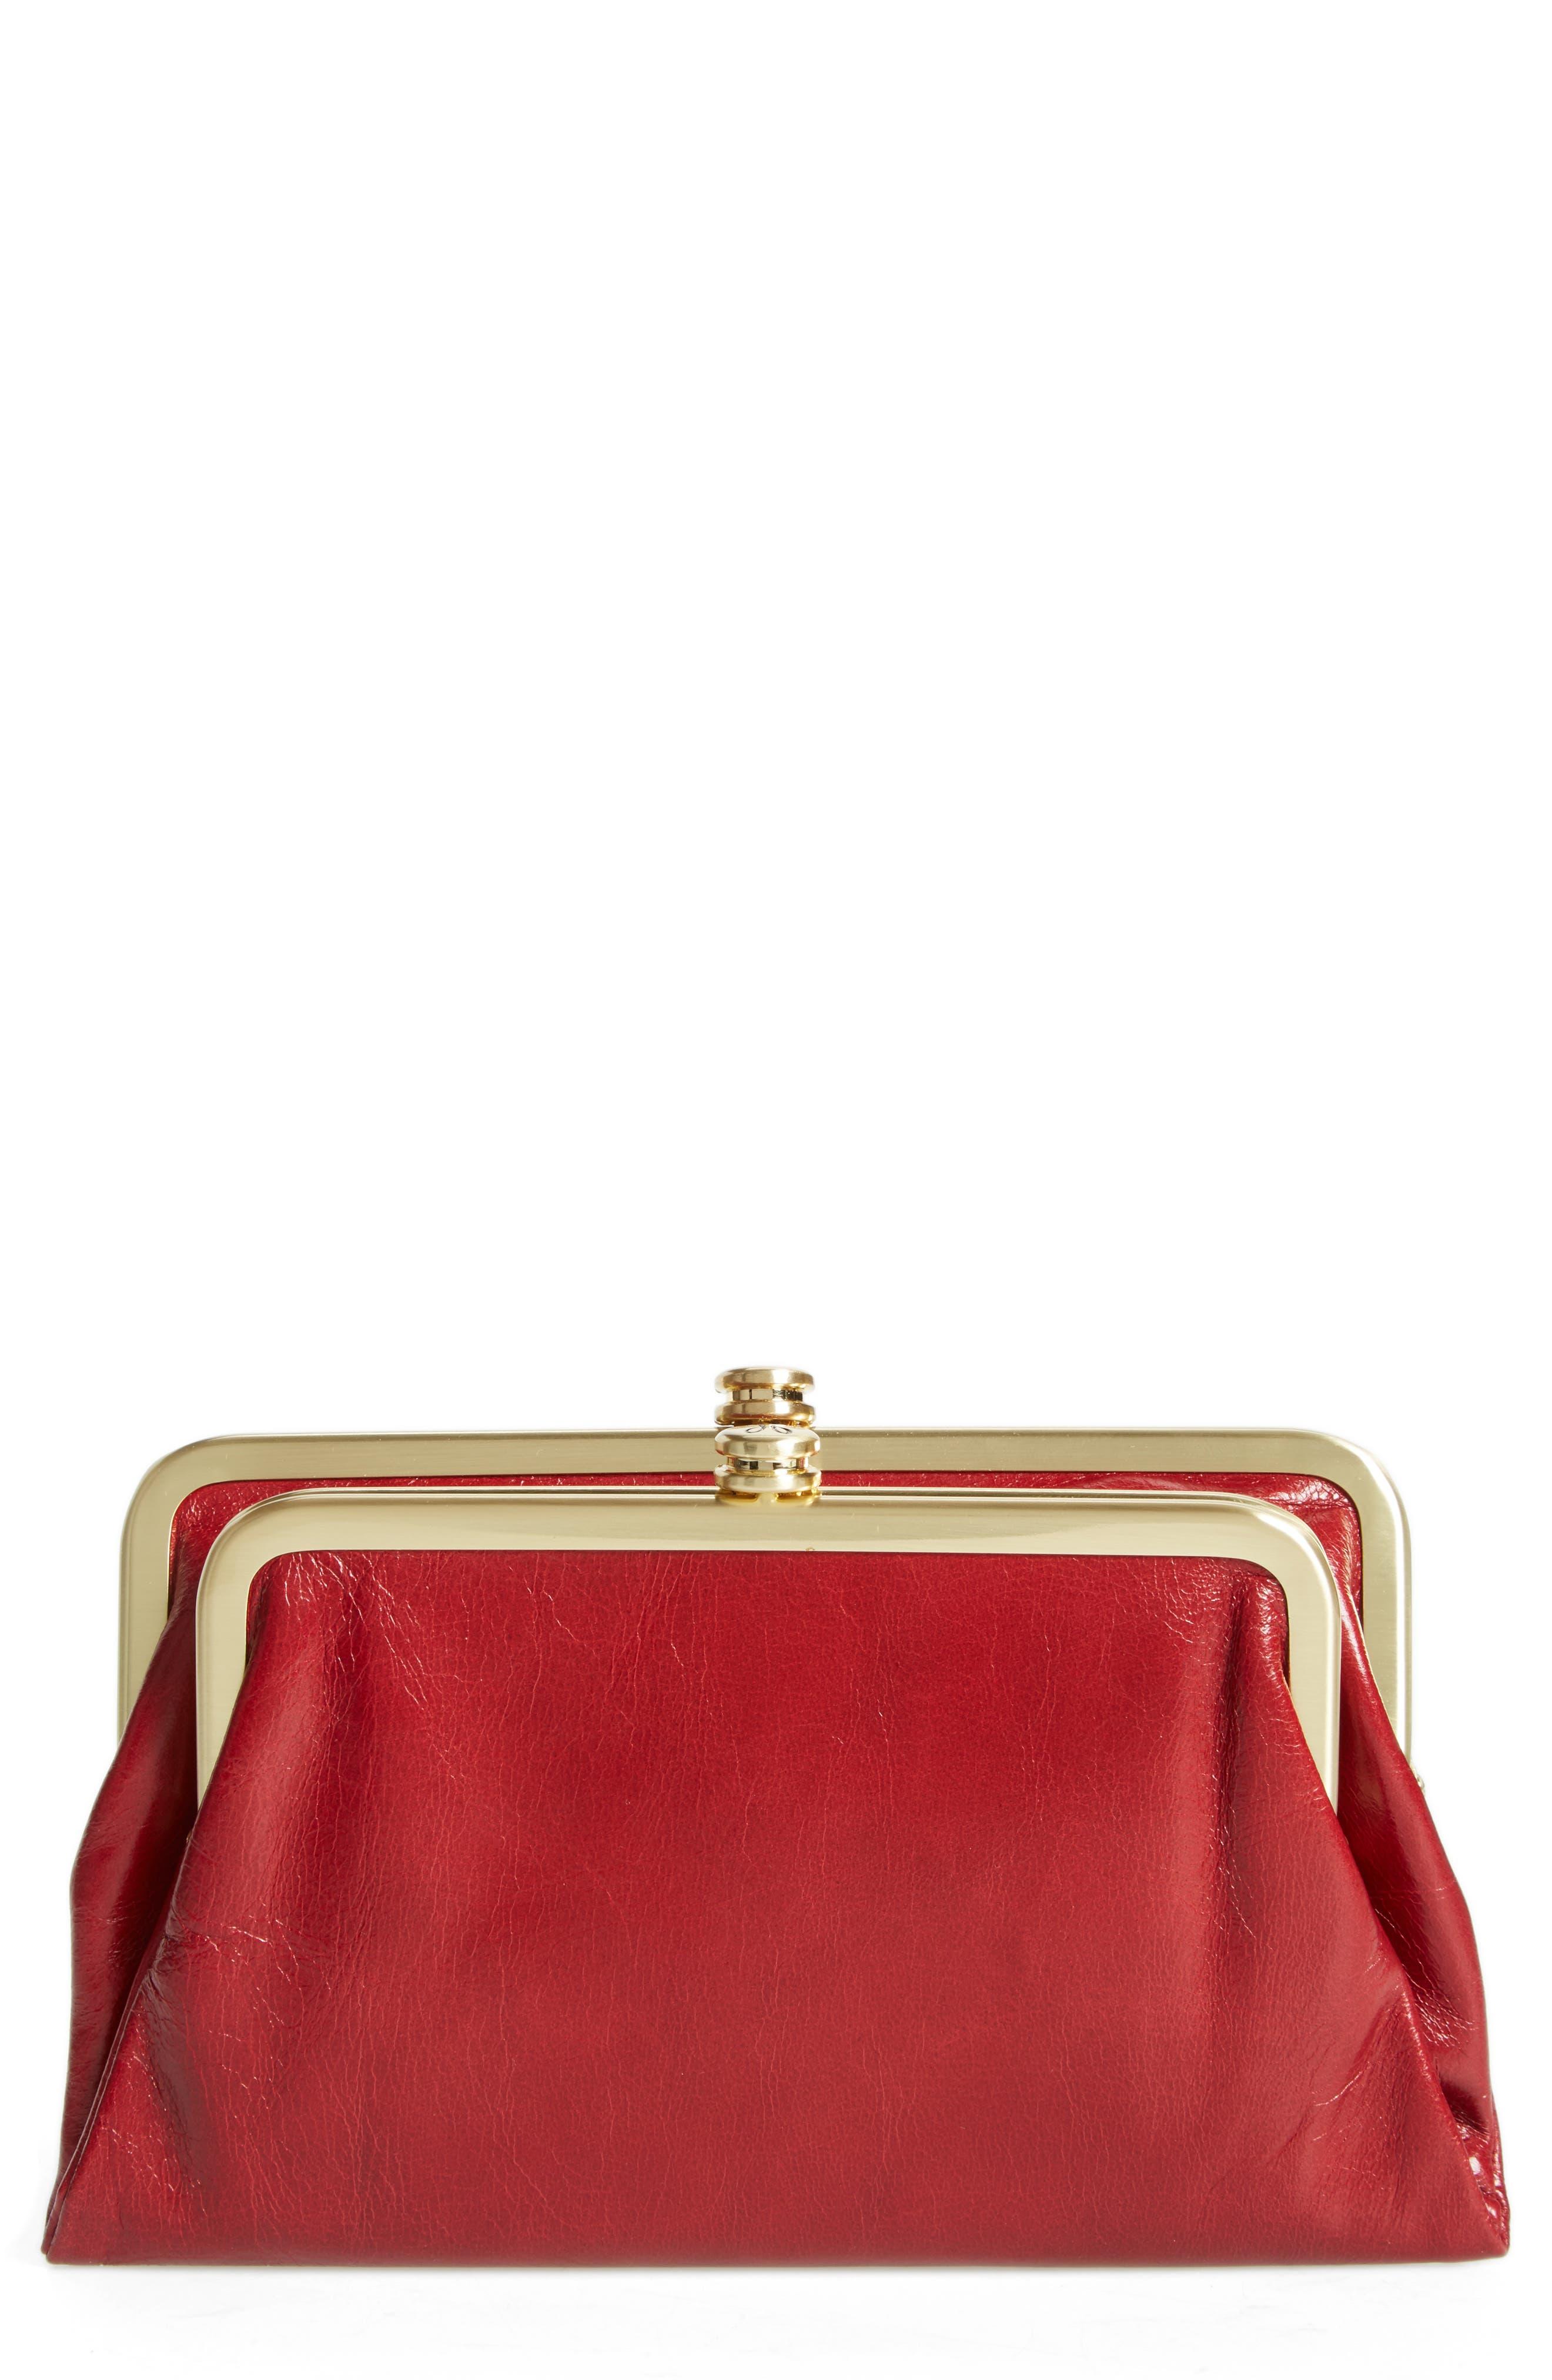 Suzette Calfskin Leather Wallet,                             Main thumbnail 1, color,                             Cardinal